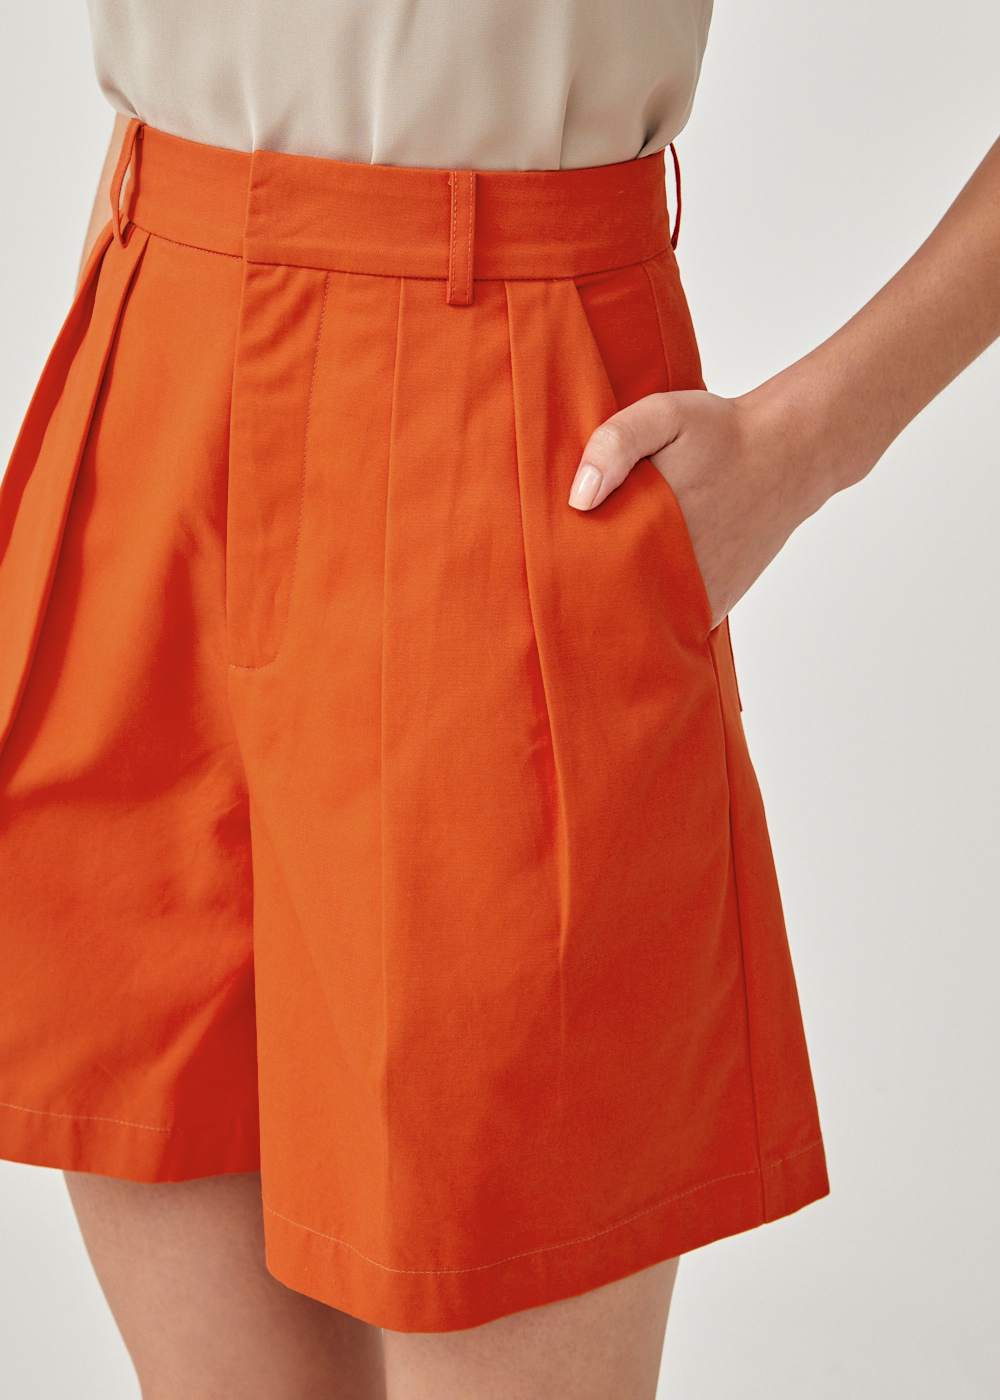 Amarantha High Waist Shorts